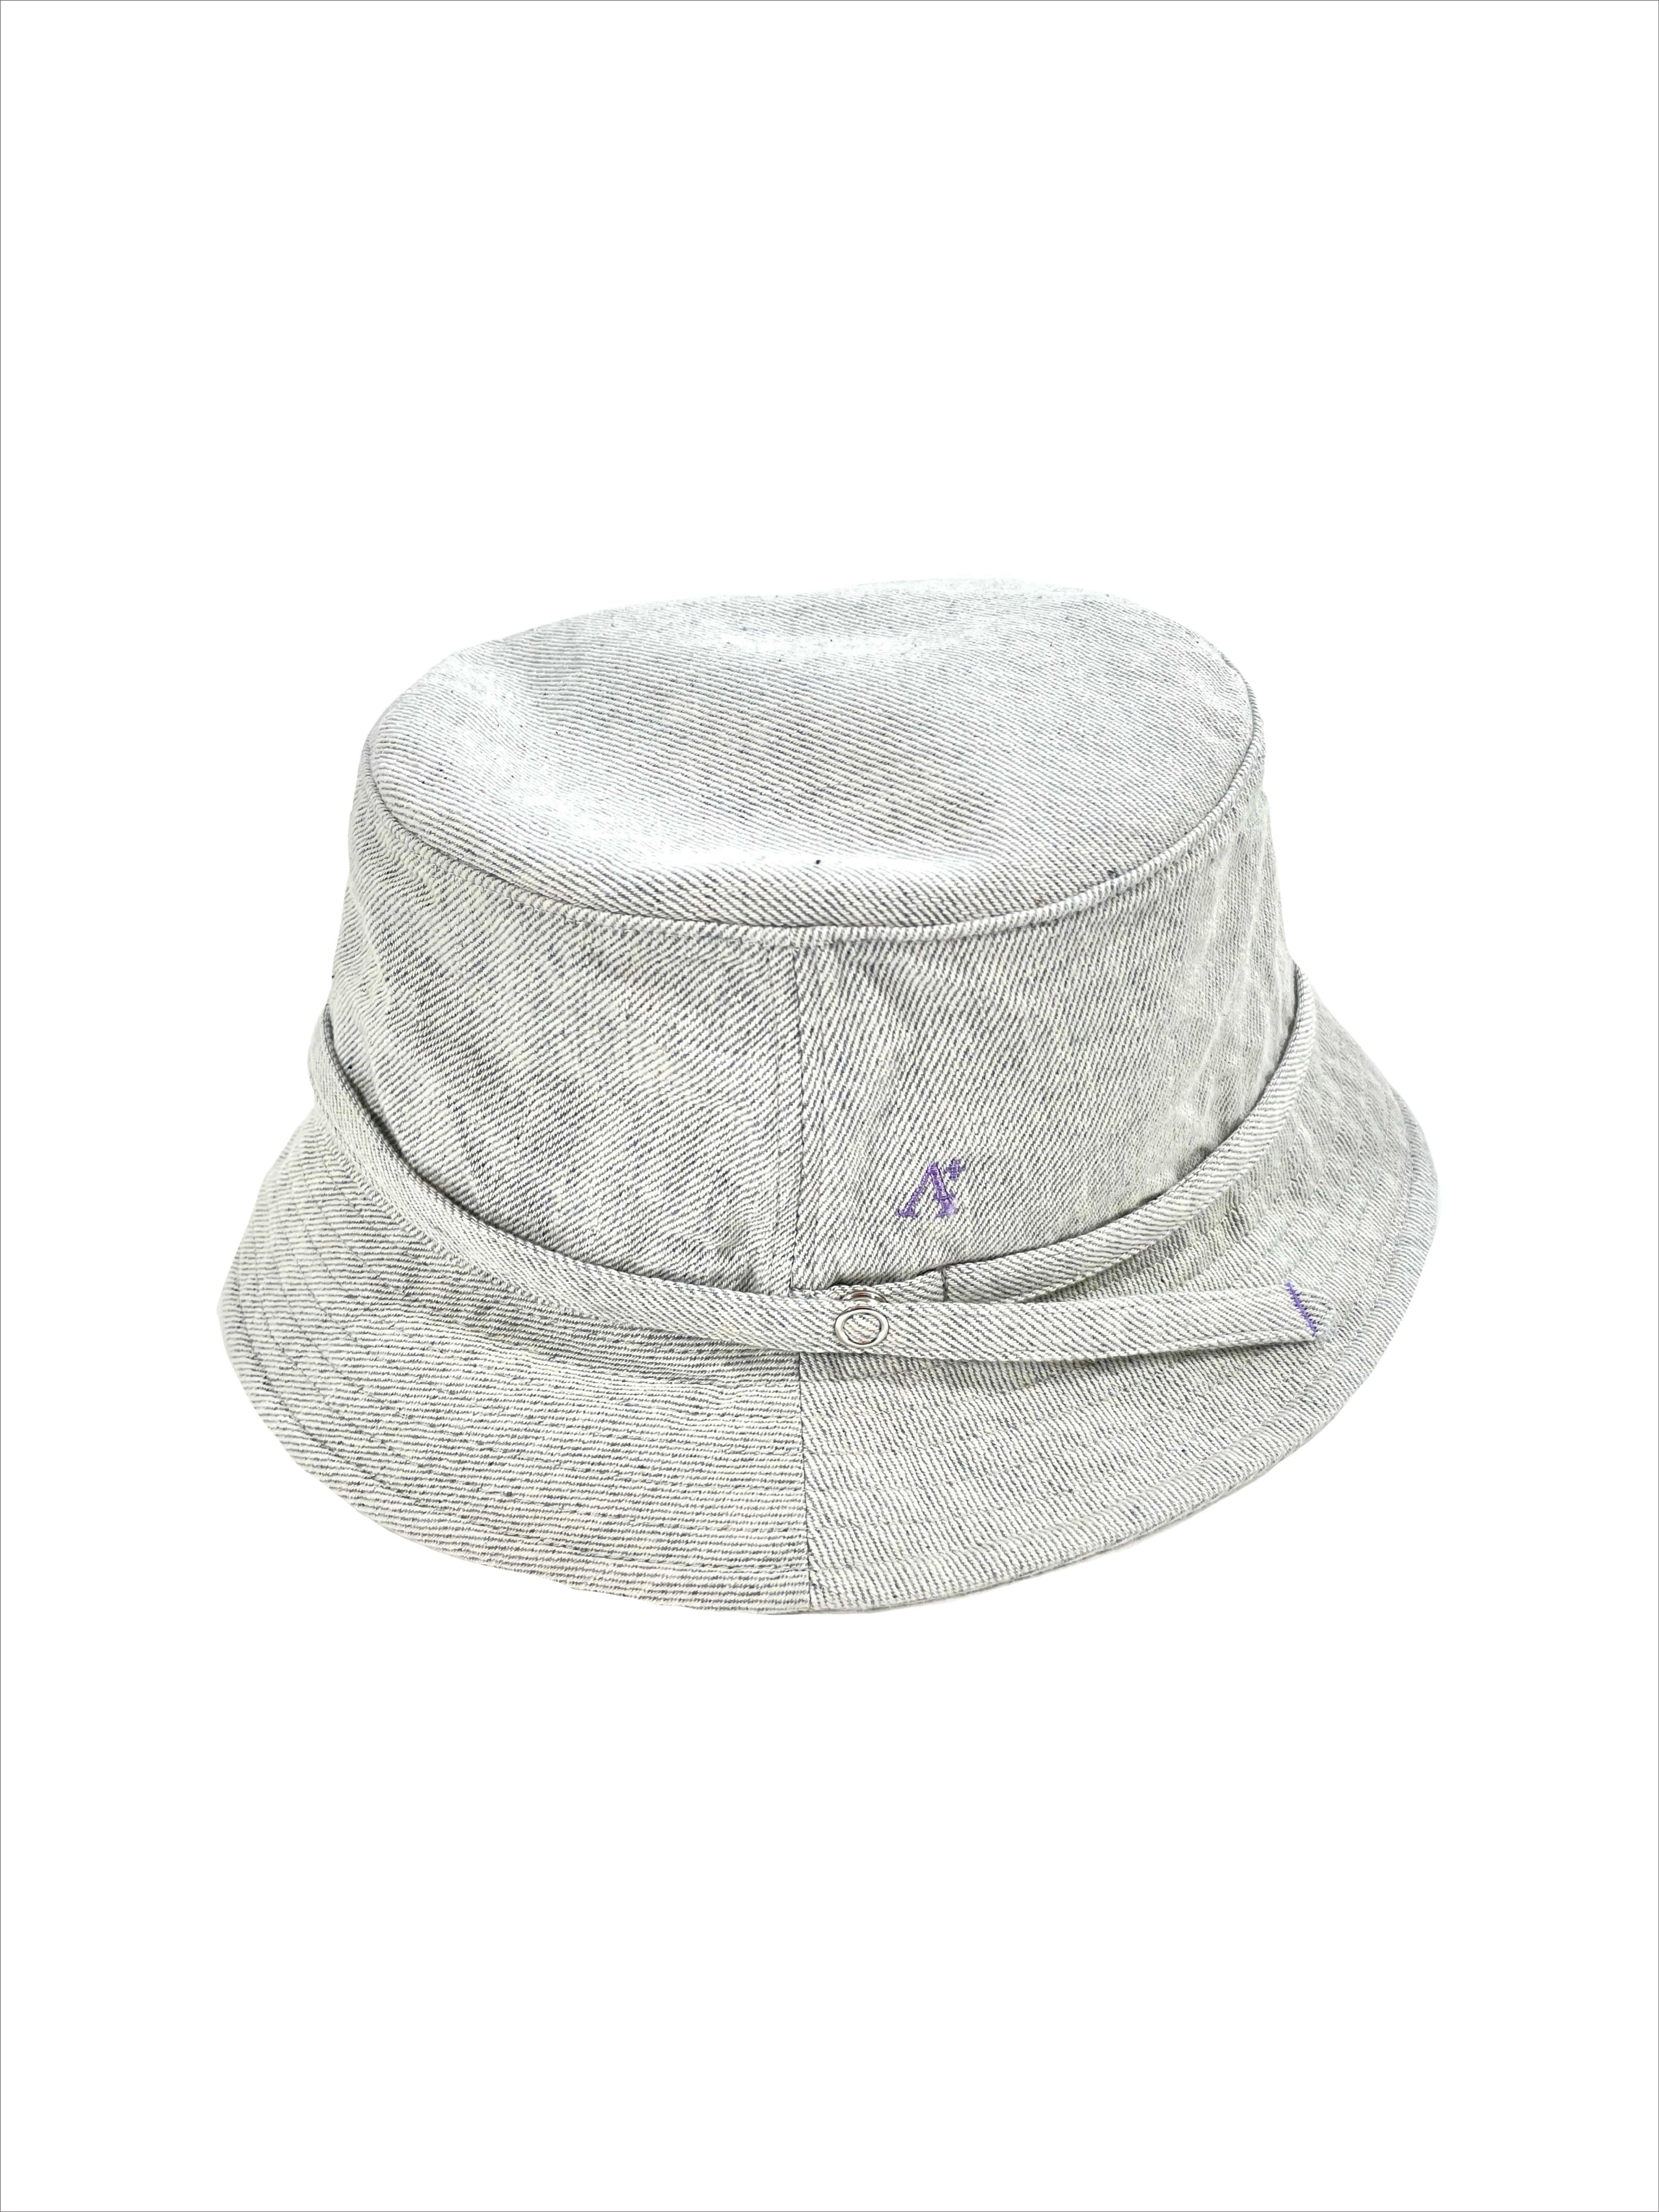 DAILY BUCKET HATのサムネイル3